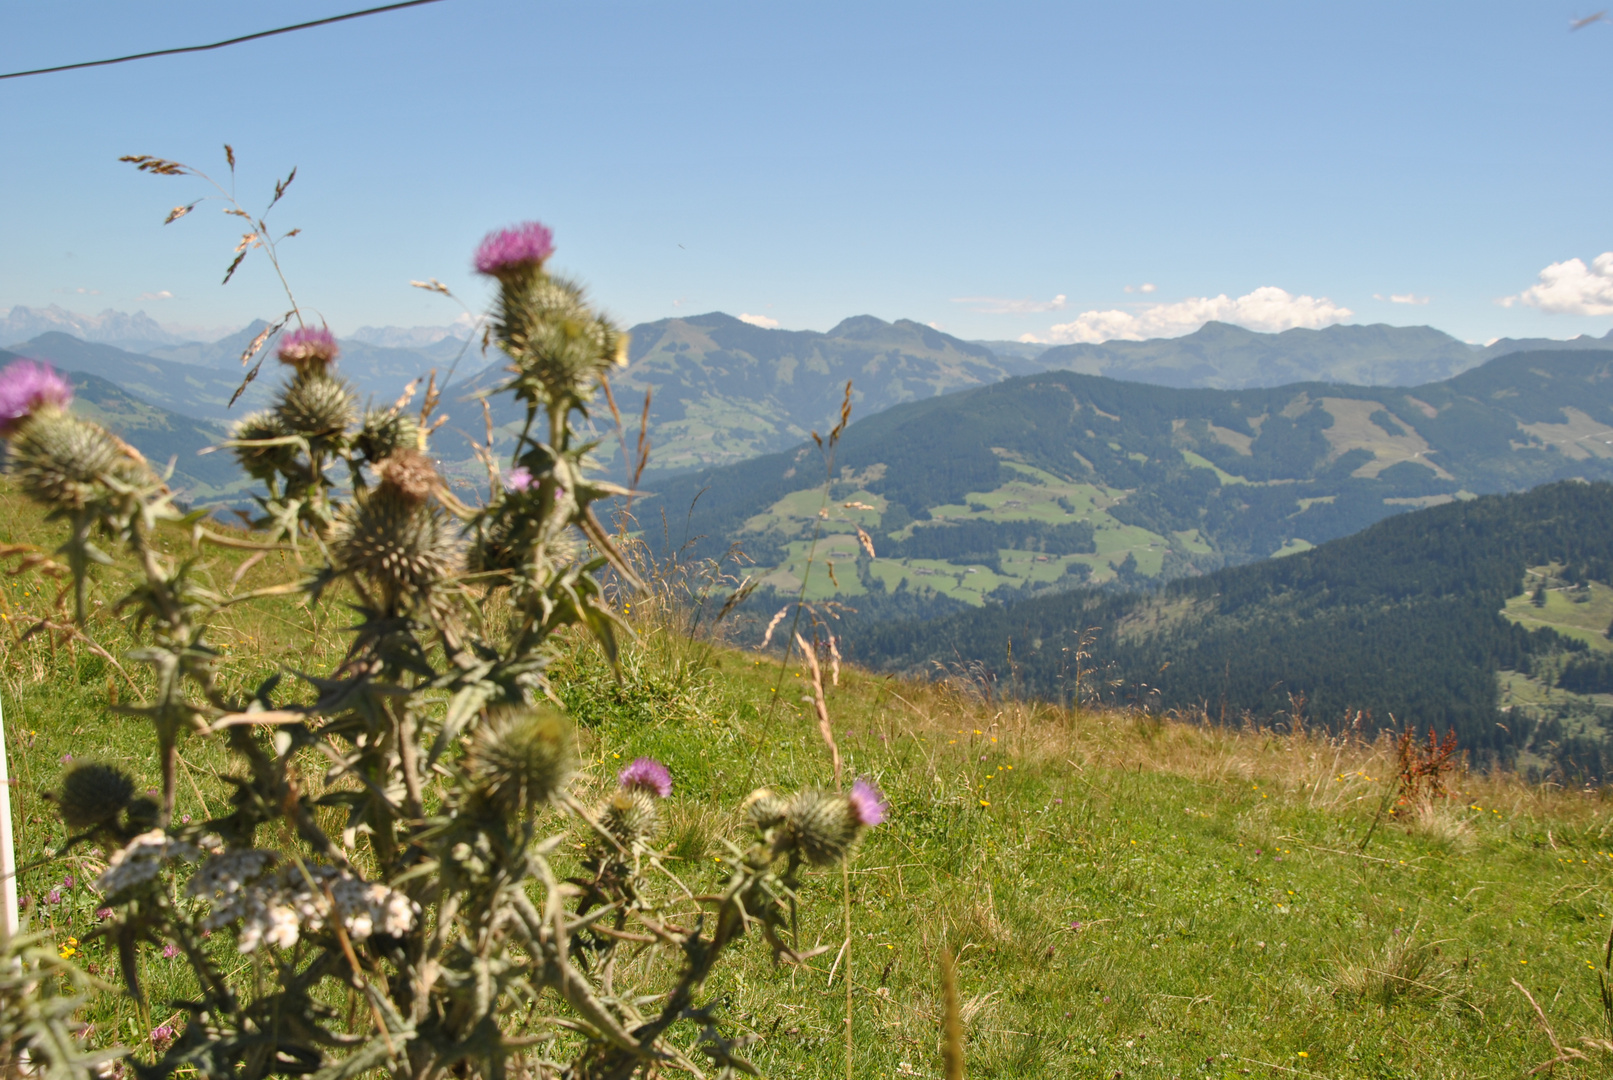 Wunderschöner Ausblick vom 1300 Meter hochgelegeenen Markbachjoch